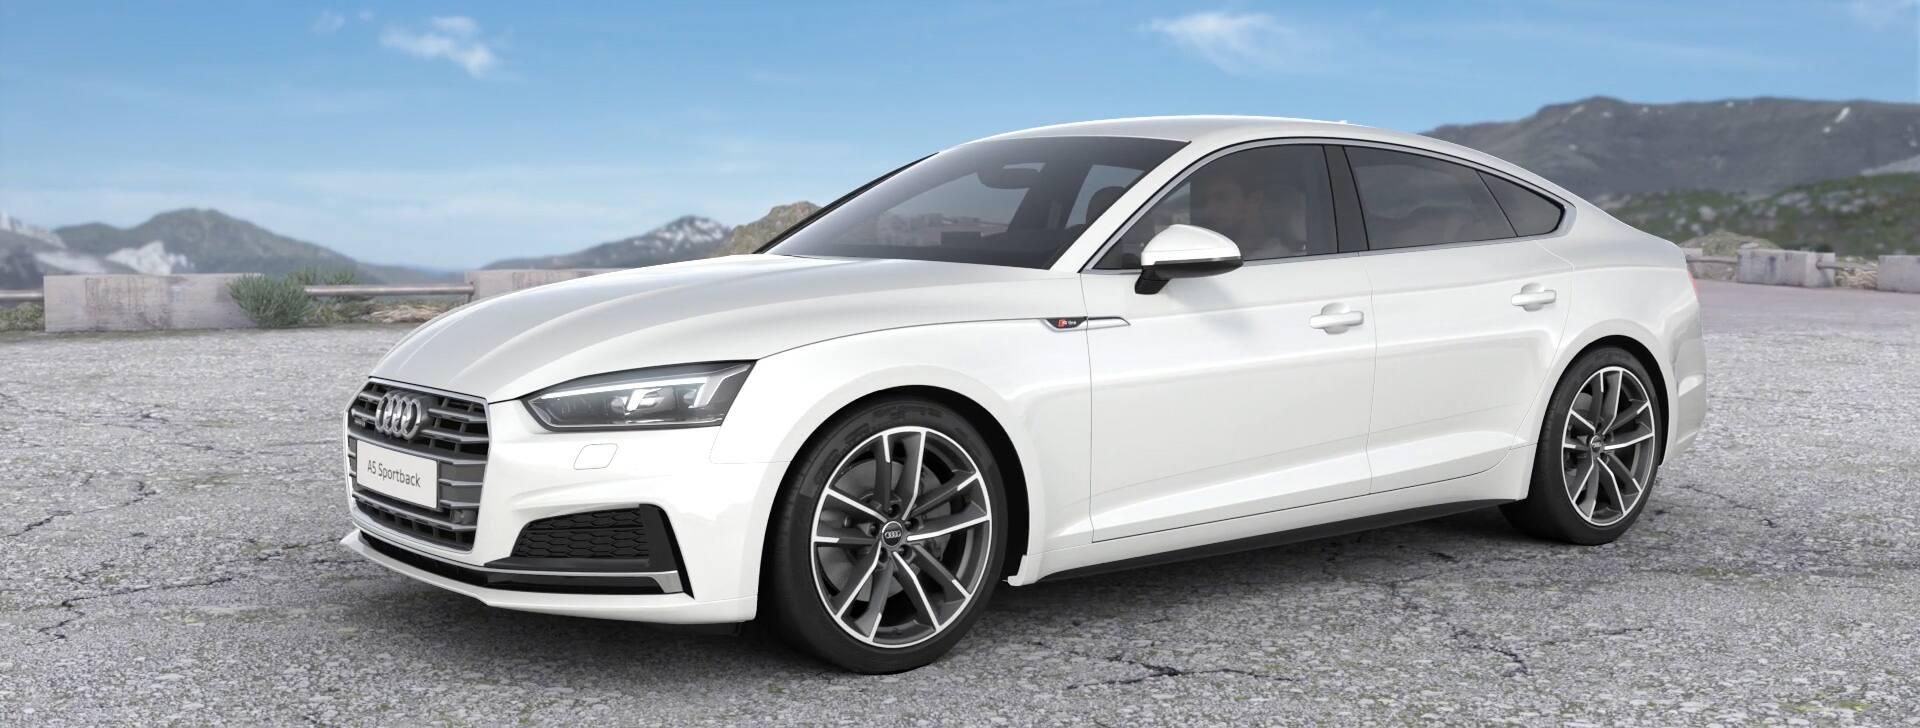 Audi A Sportback A Audi Middle East - Audi a5